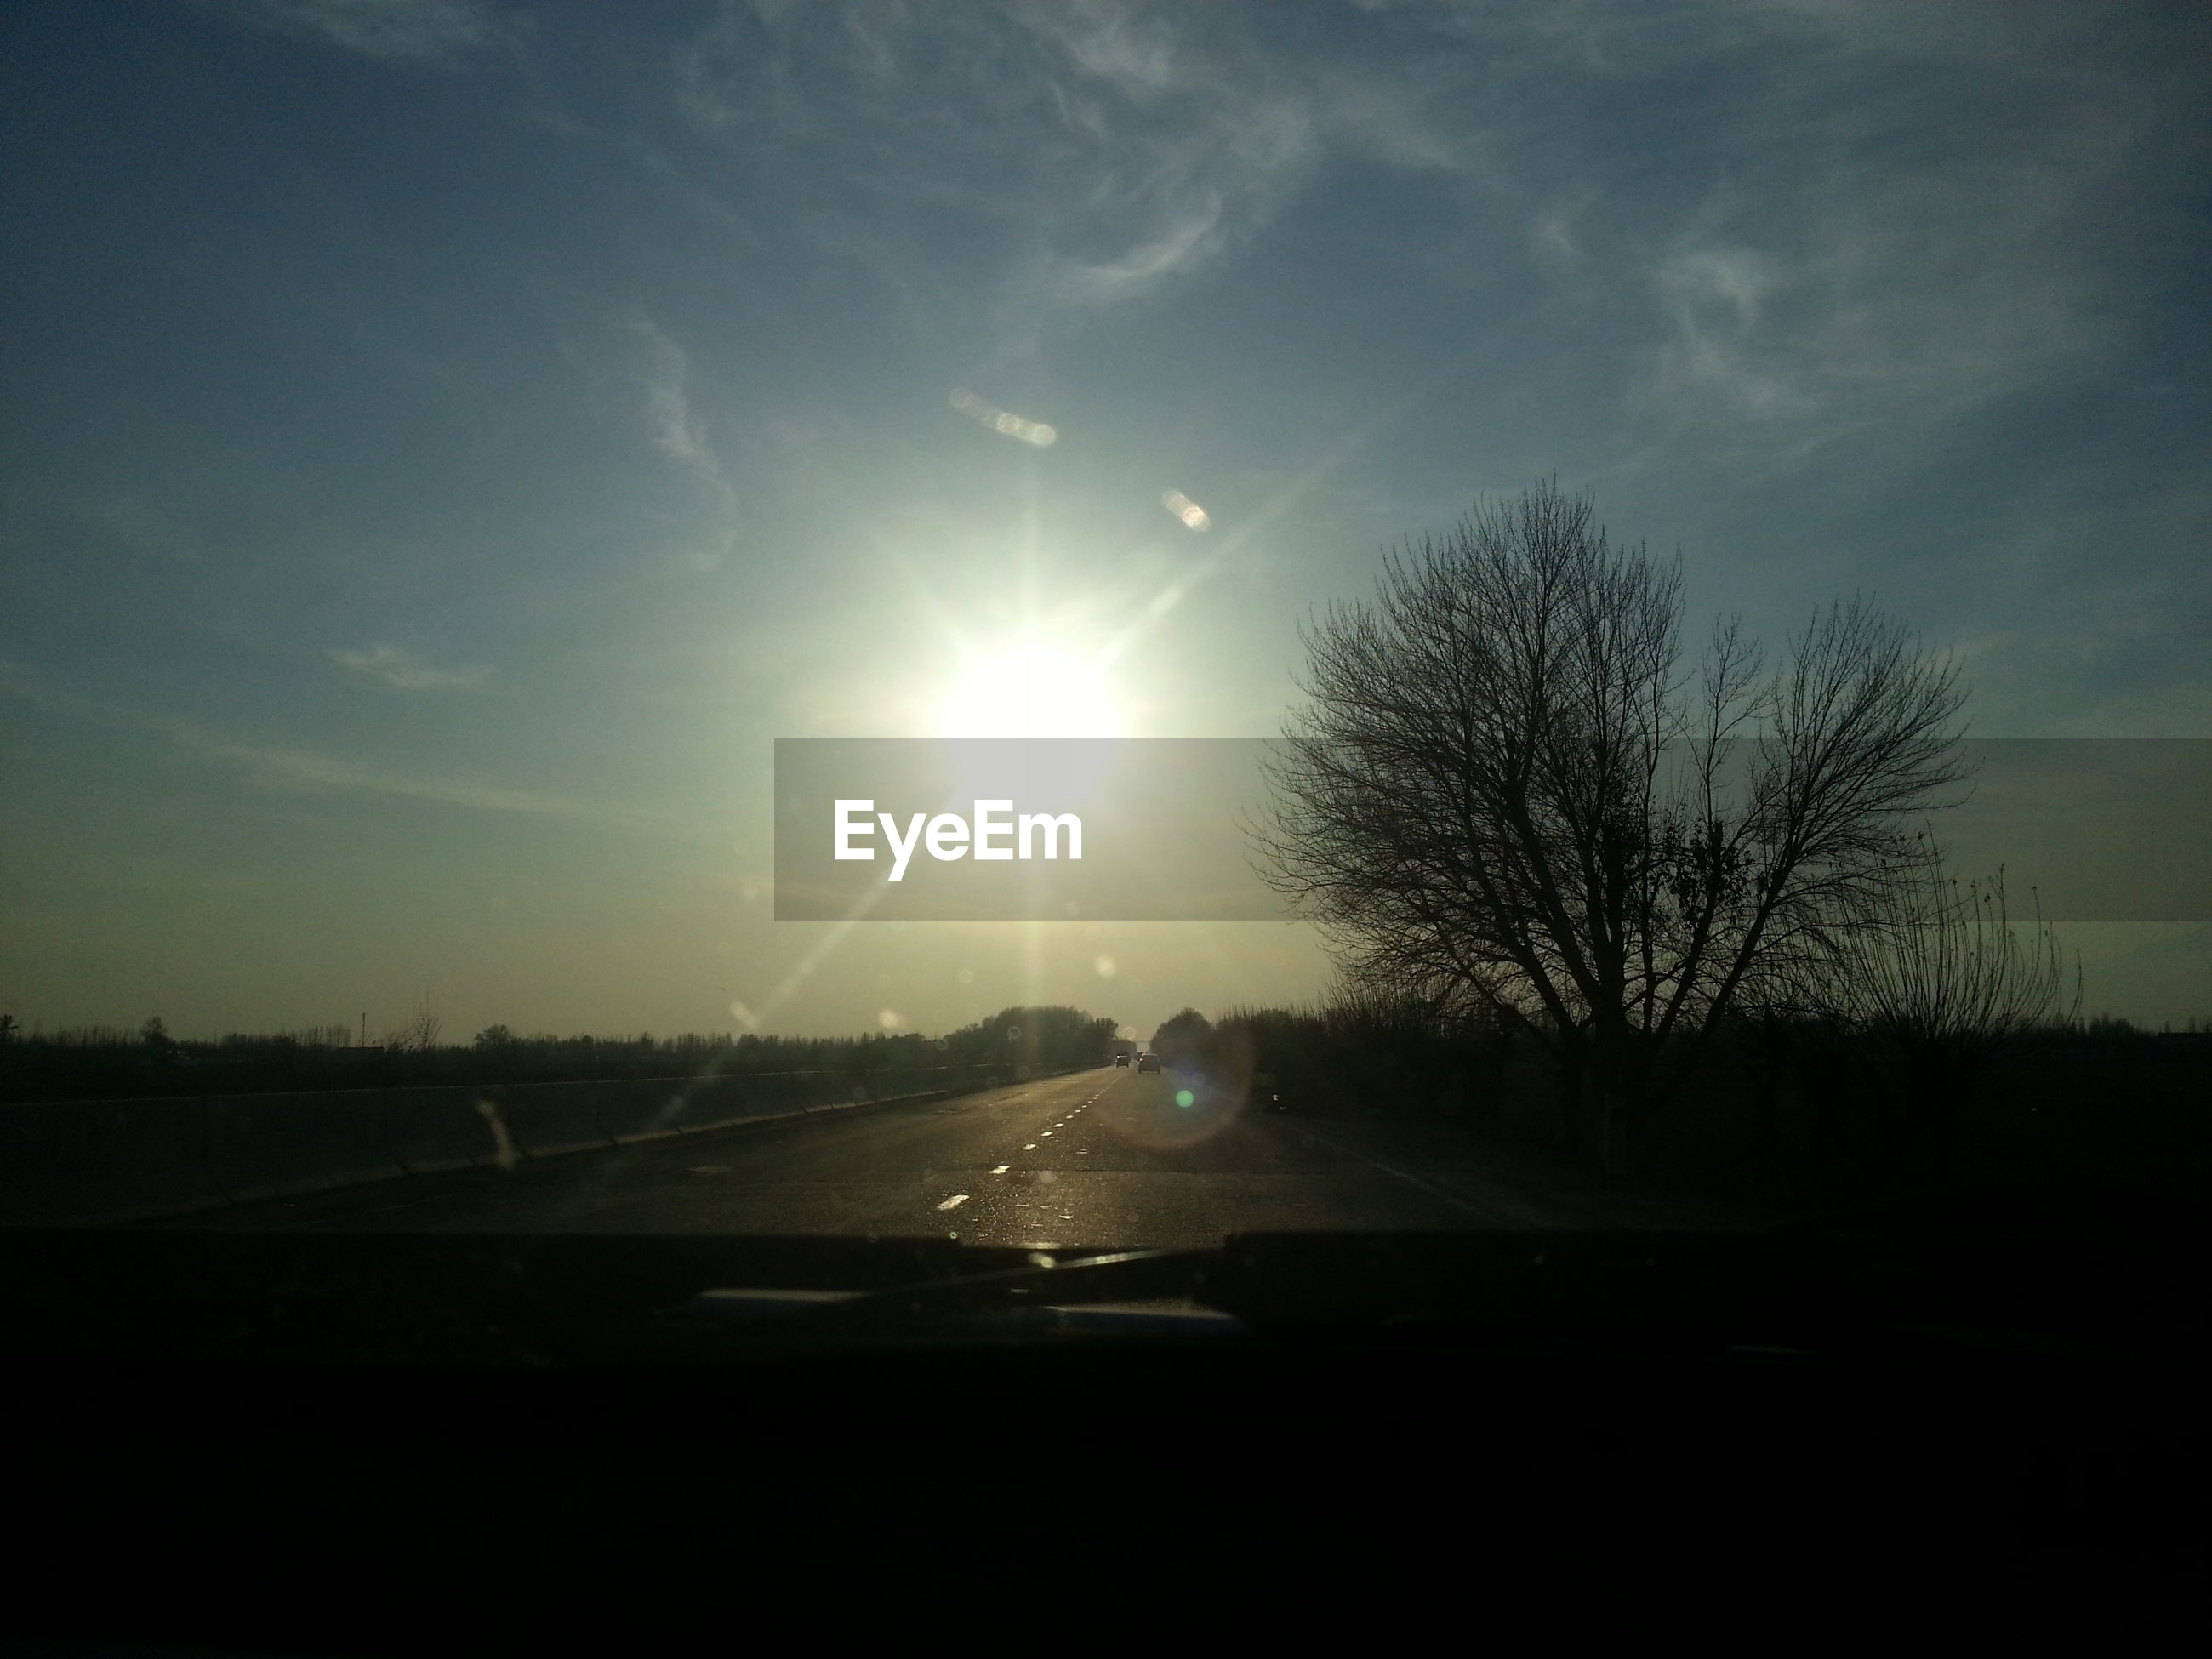 sun, transportation, sunset, silhouette, sky, car, land vehicle, road, lens flare, sunbeam, sunlight, mode of transport, tree, nature, tranquility, landscape, cloud - sky, tranquil scene, beauty in nature, scenics